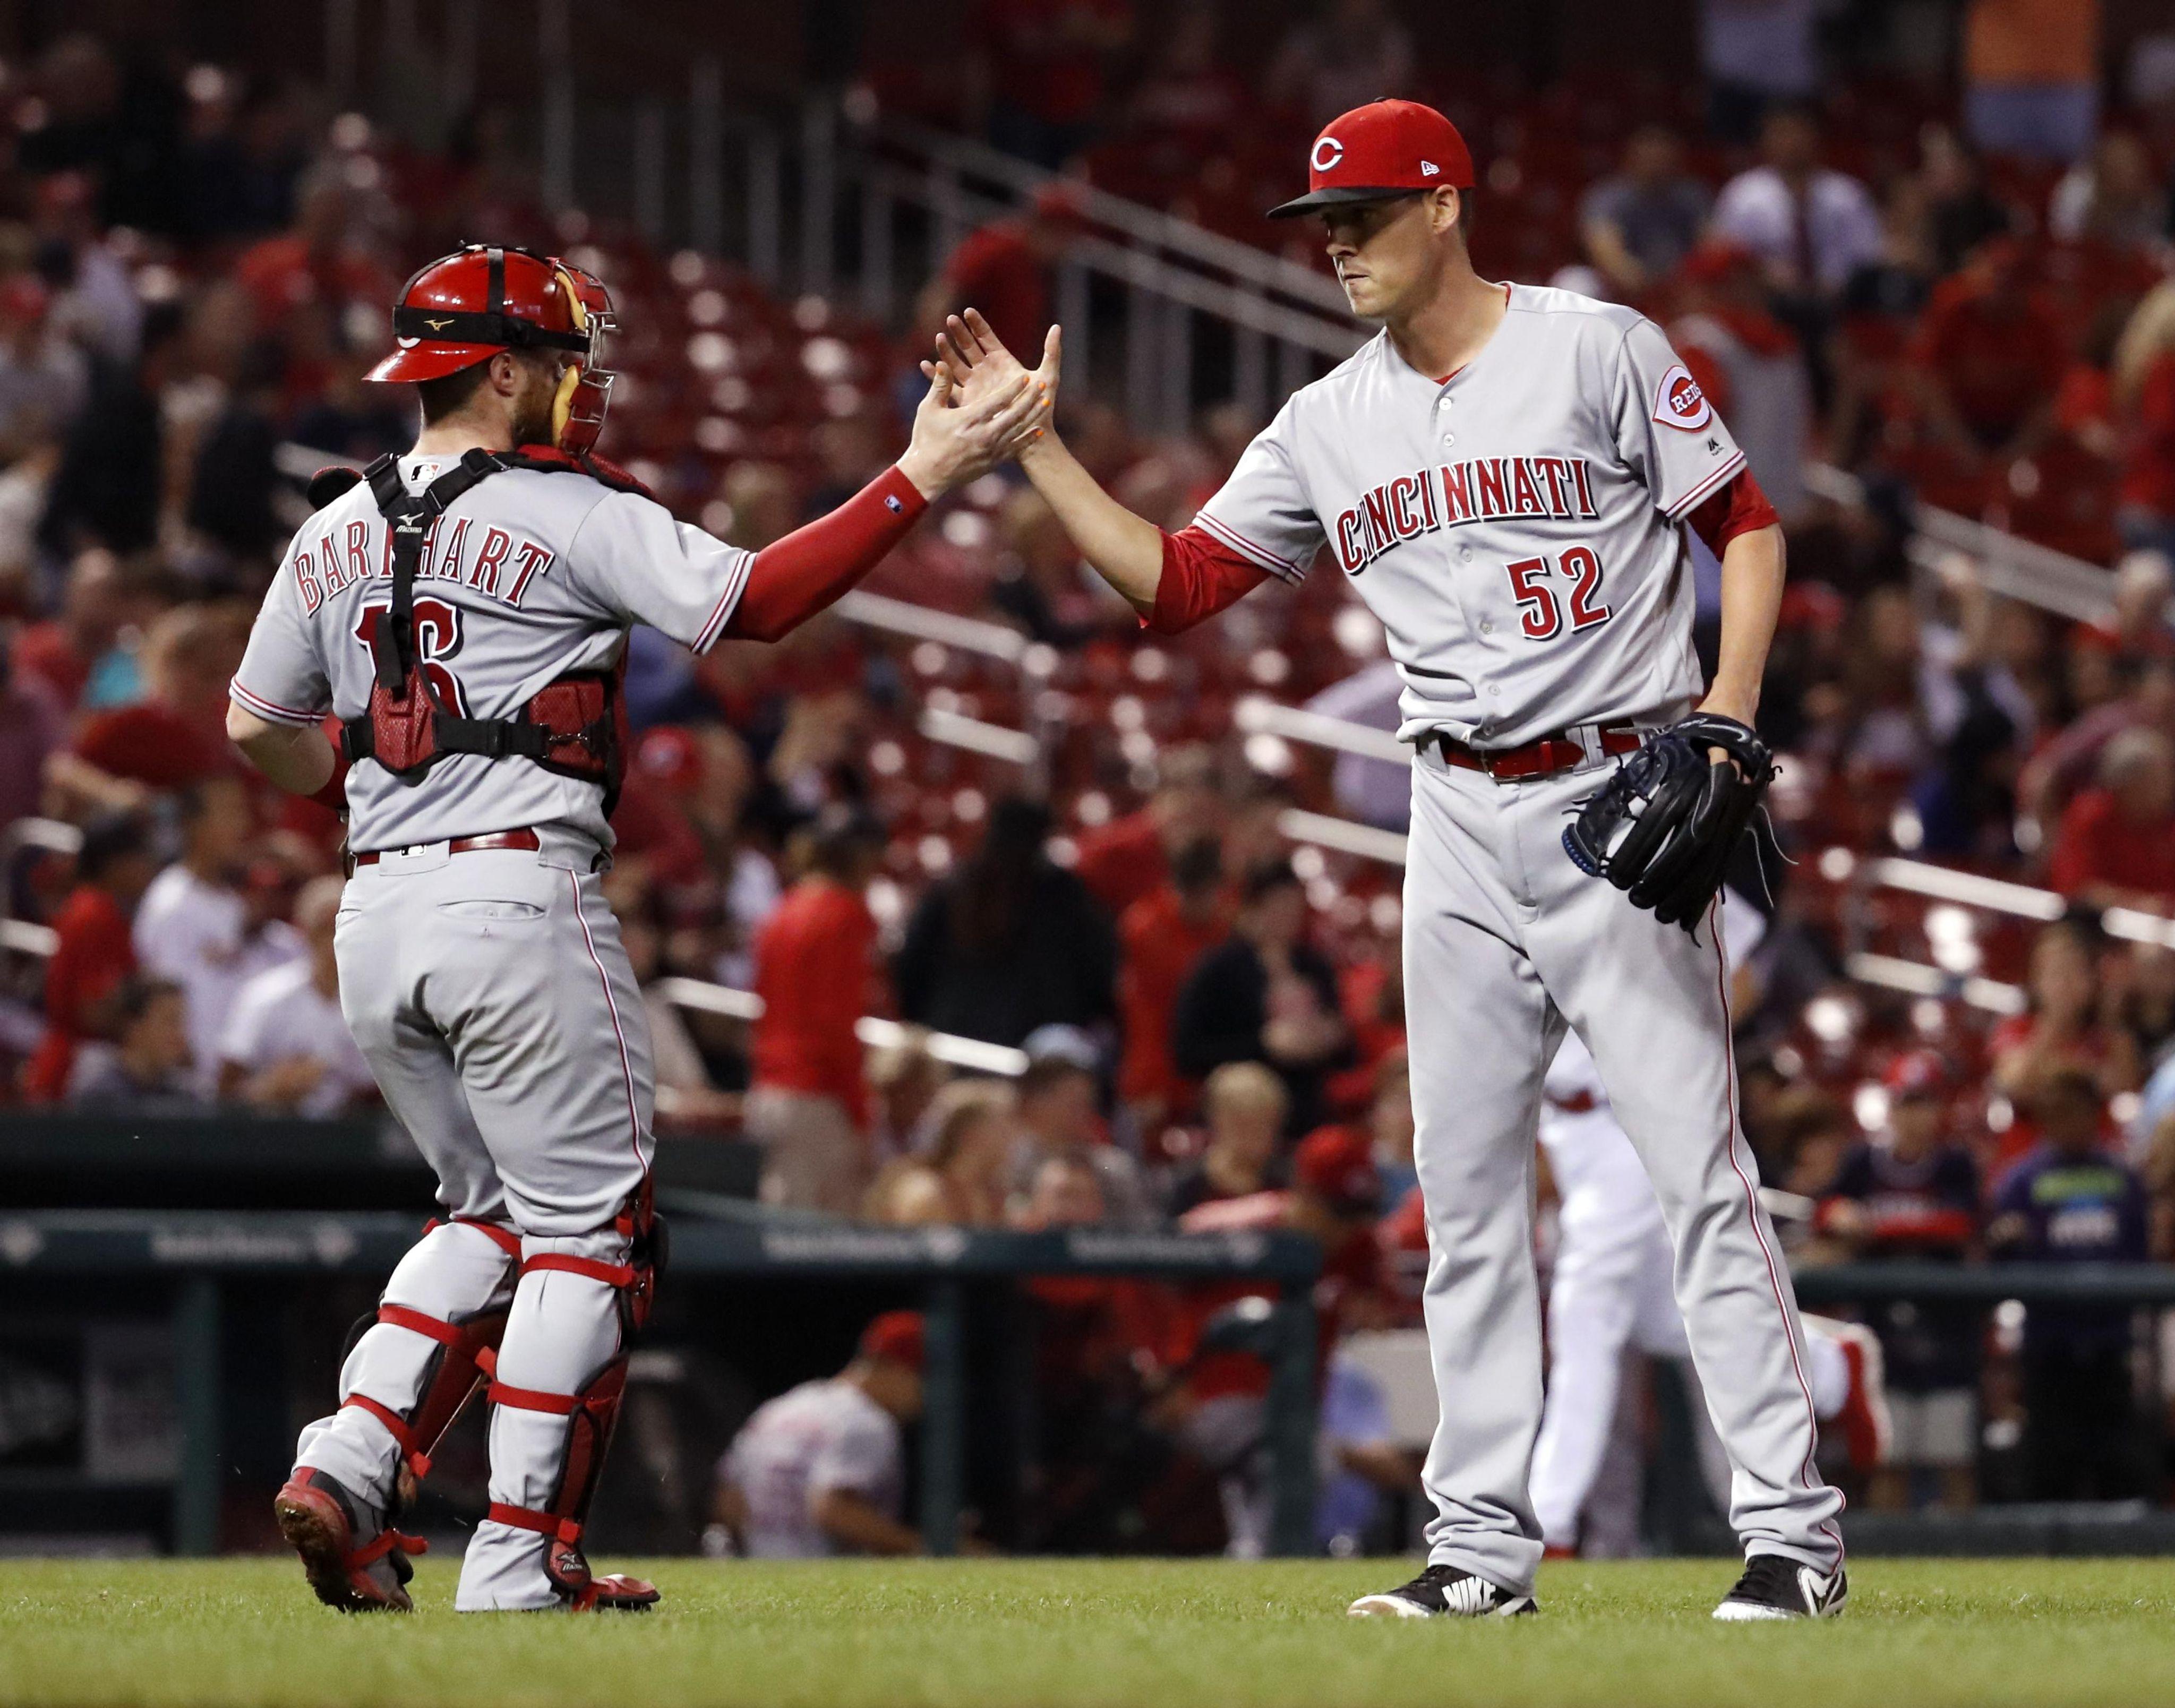 Reds_cardinals_baseball_22636_s4096x3217